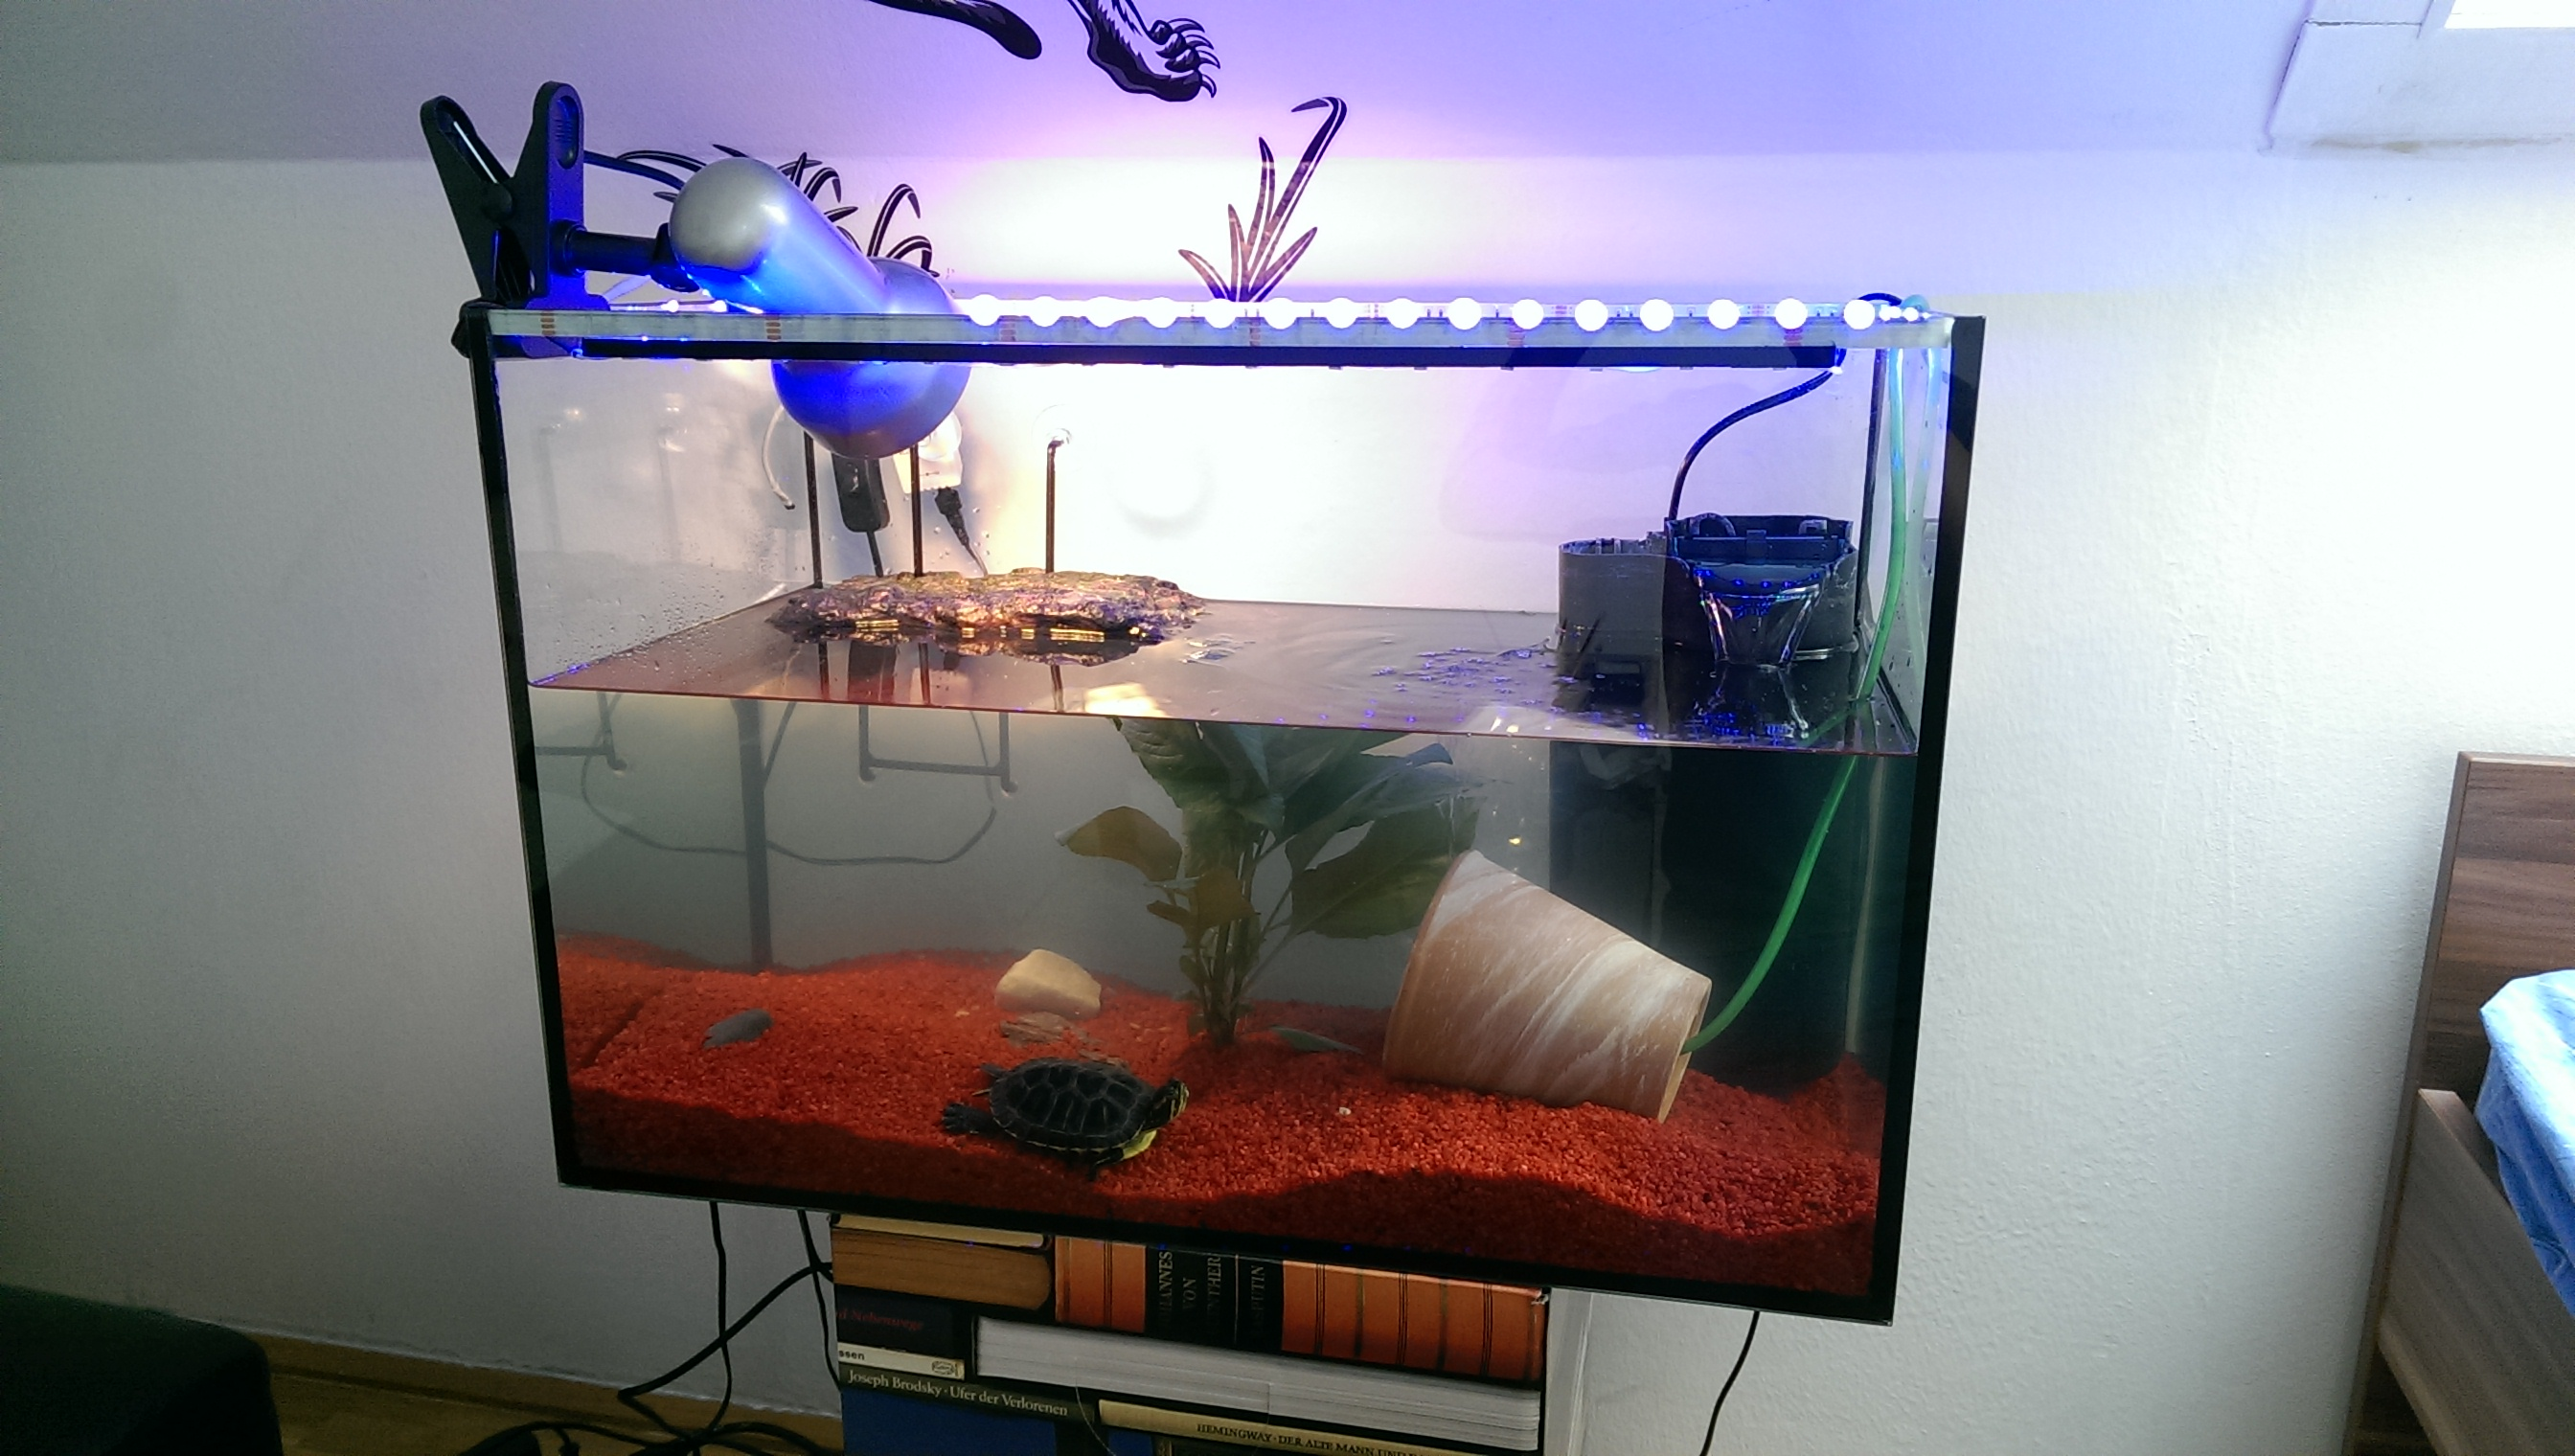 rotwangenschildkr te hilfe aquarium schildkr ten. Black Bedroom Furniture Sets. Home Design Ideas